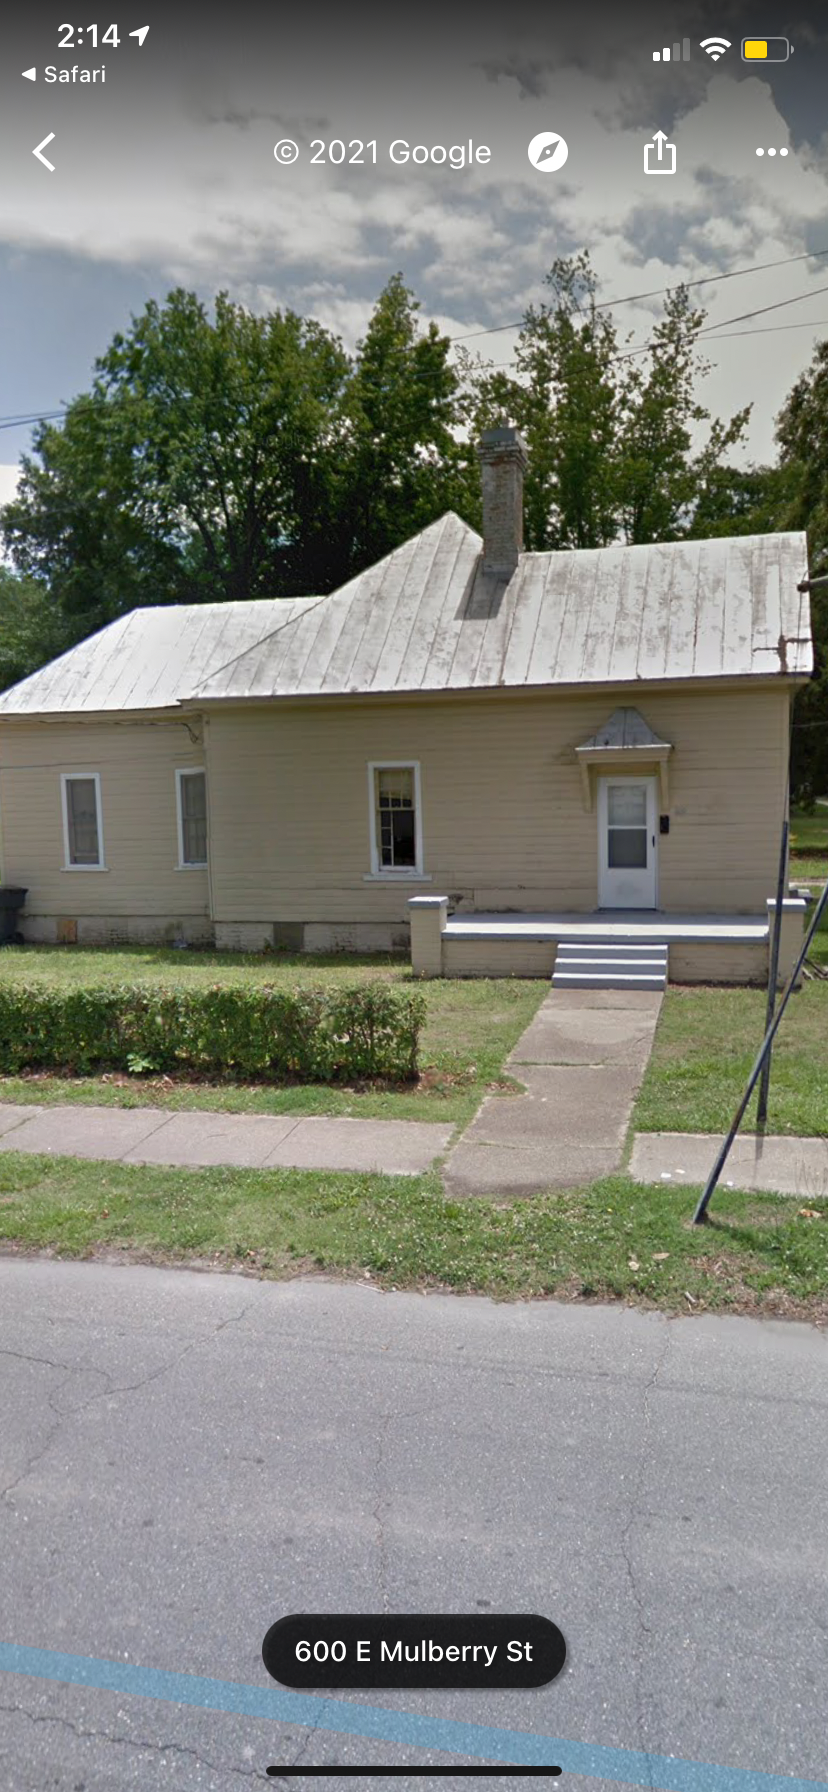 600 E Mulberry St, Goldsboro, NC